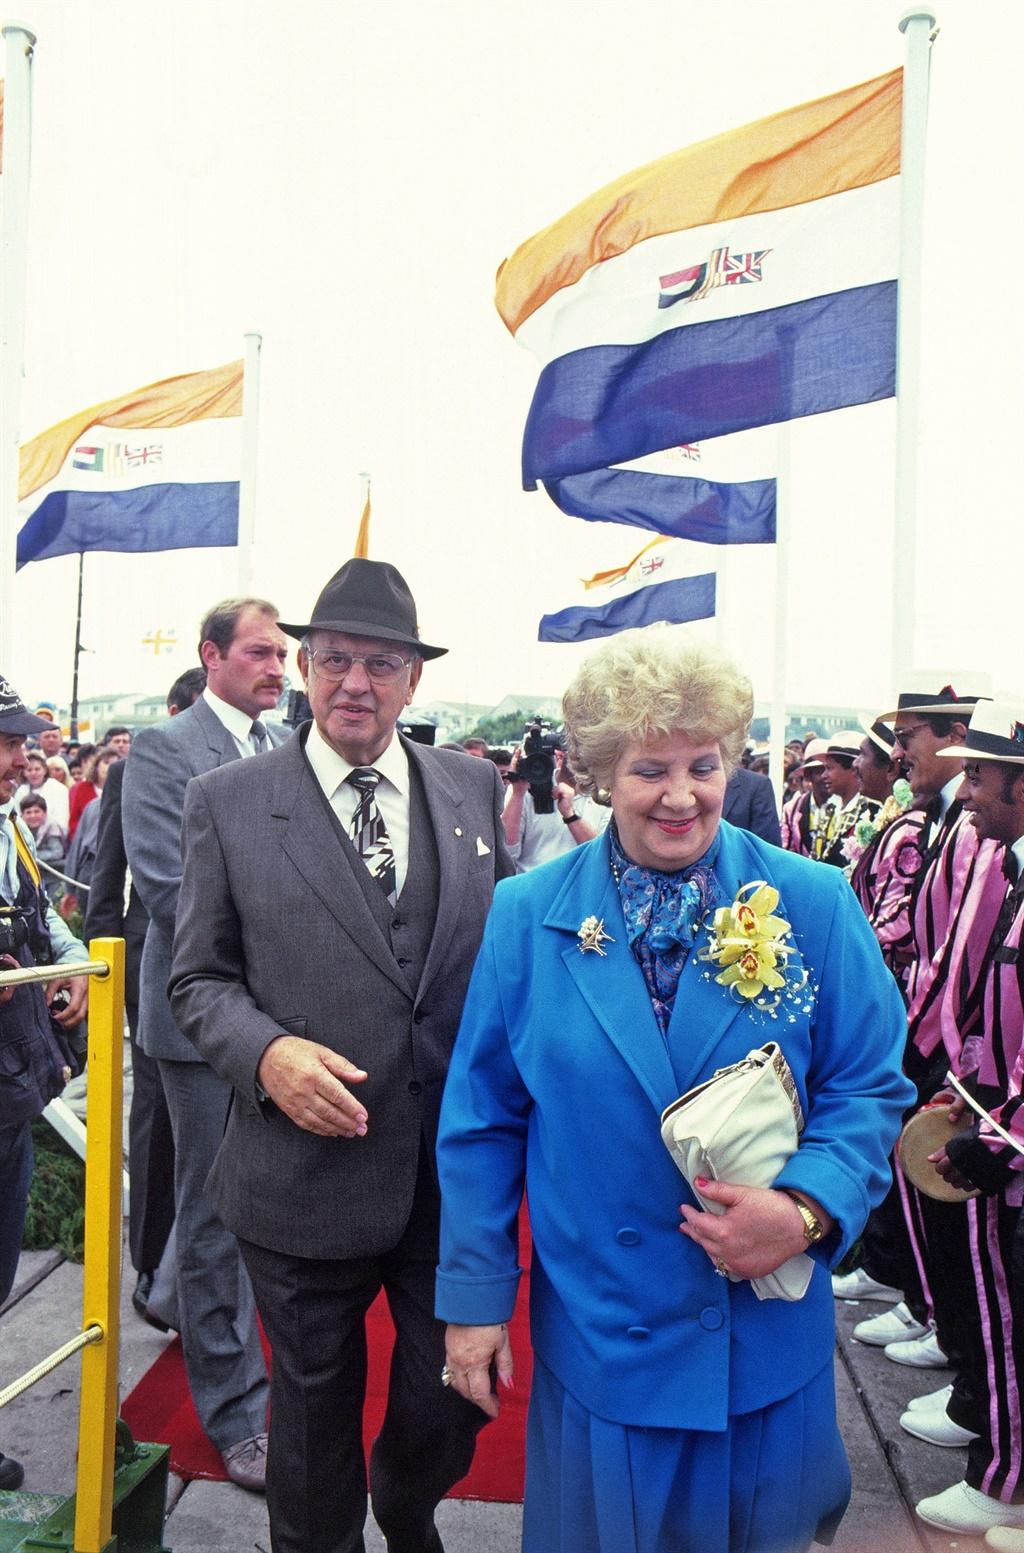 7 October 1978. South African Prime Minister B.J.